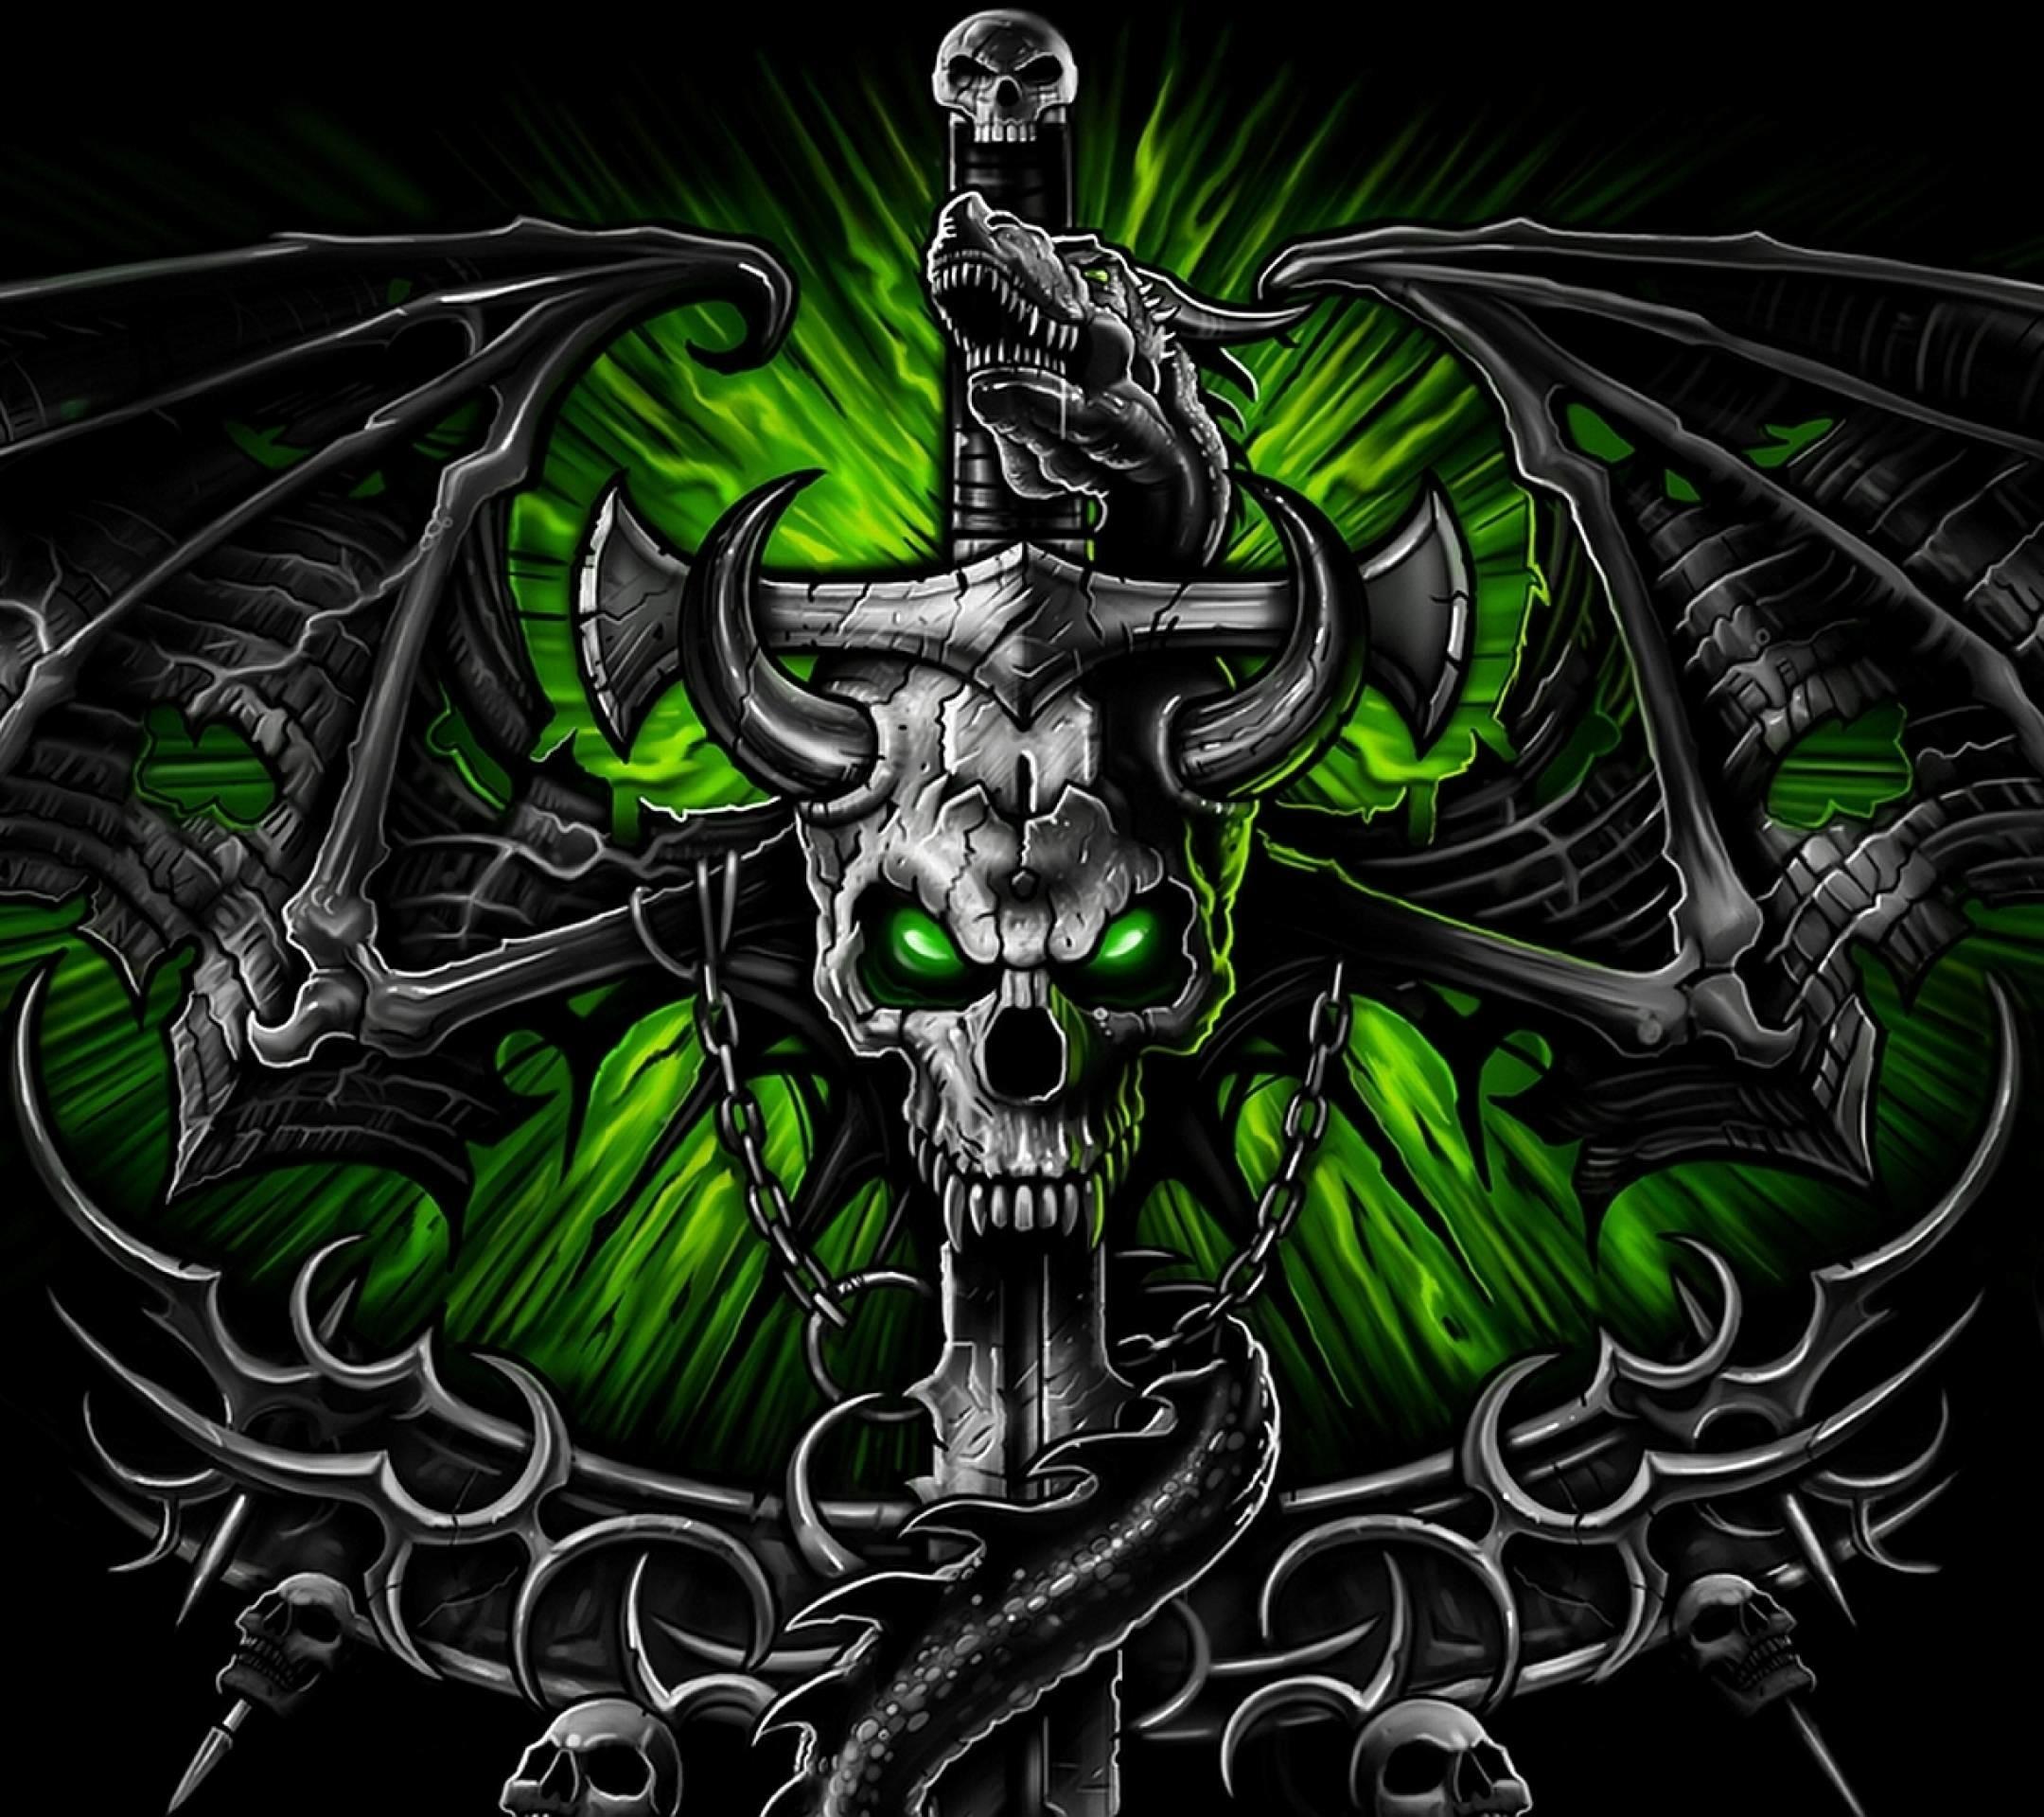 Wallpapers For > Green Skull Wallpaper